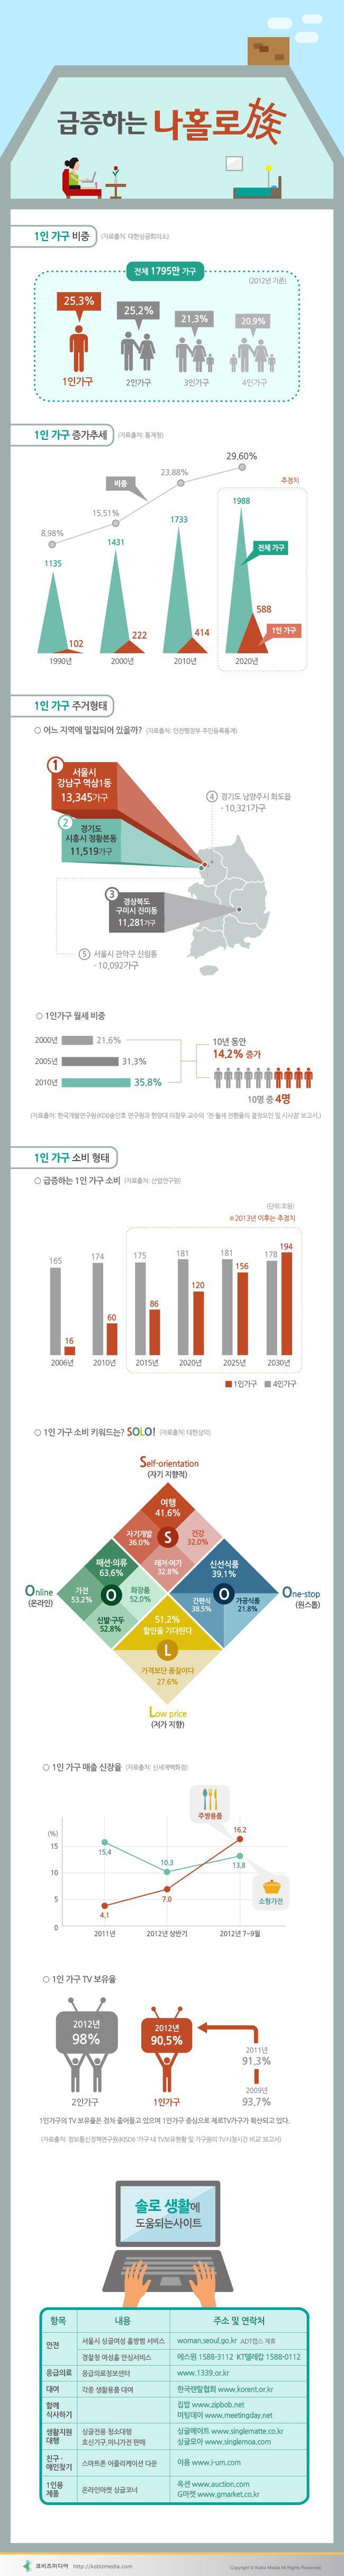 #Infographic [Korean]  급증하는 나홀로족